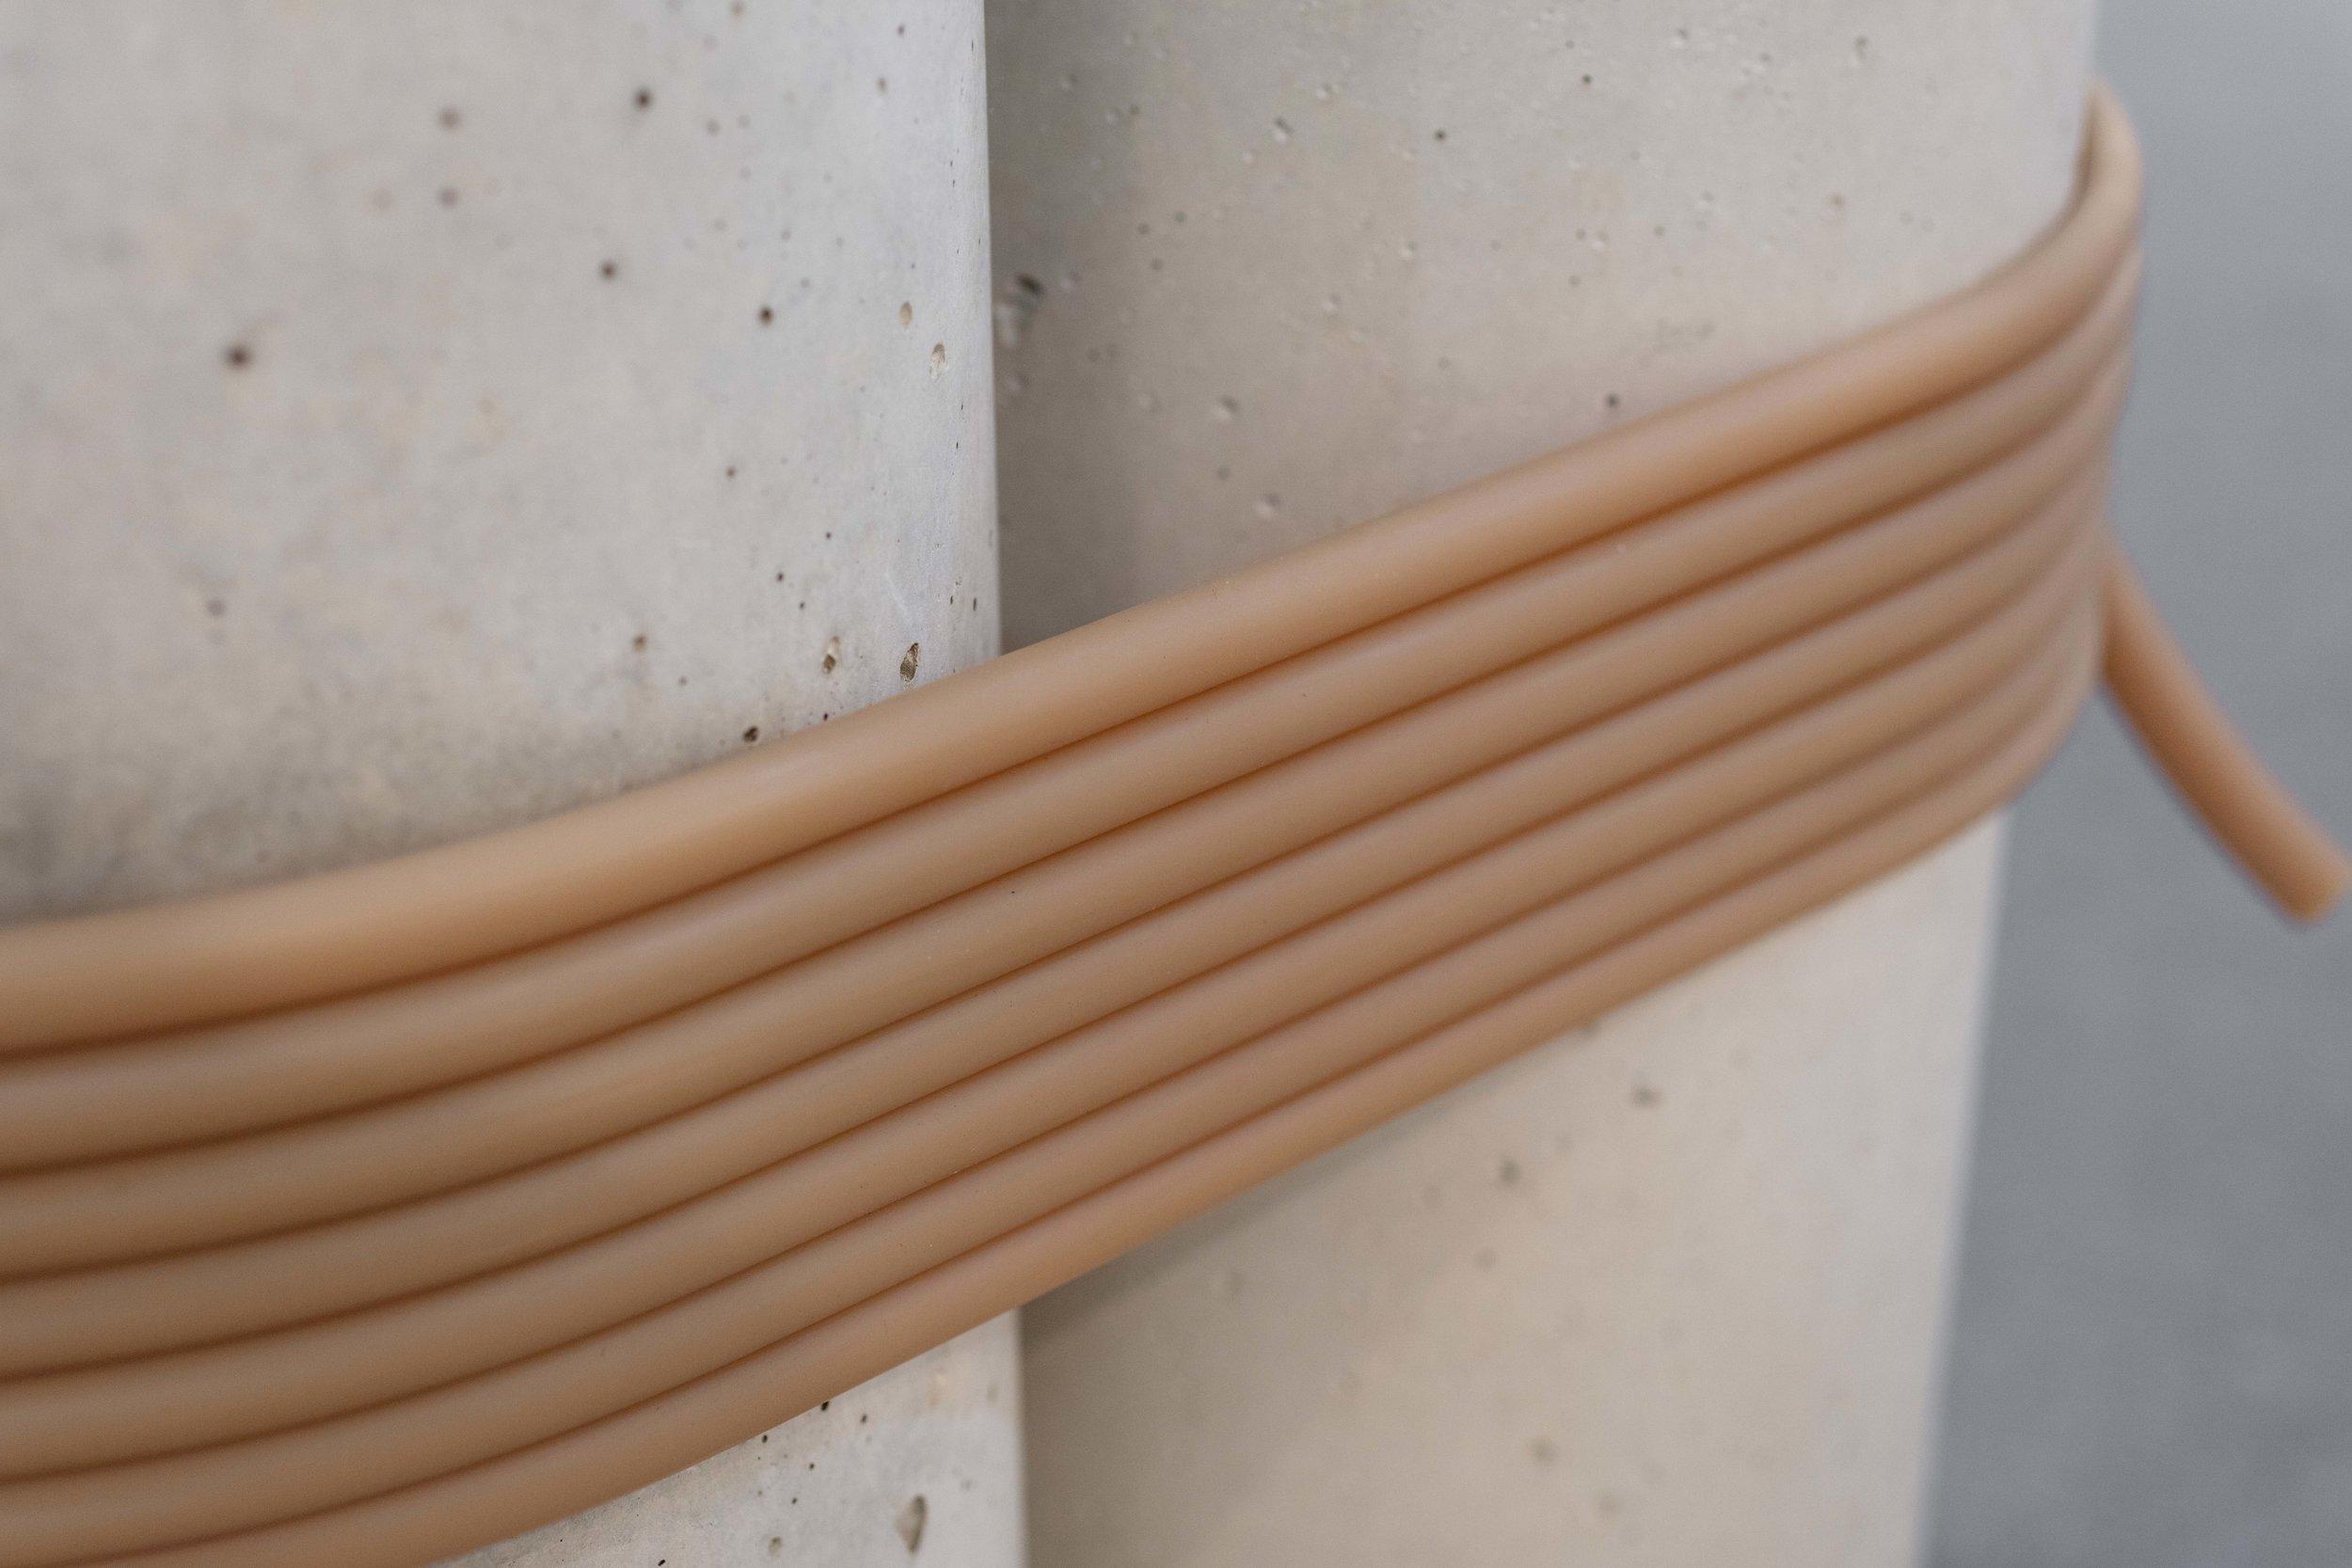 Tezontle,  Abrazo  , 2018. Pigmented concrete, rubber band, 120 x 60 x 60 cm. (47.2 x 23.6 x 23.6 in.)